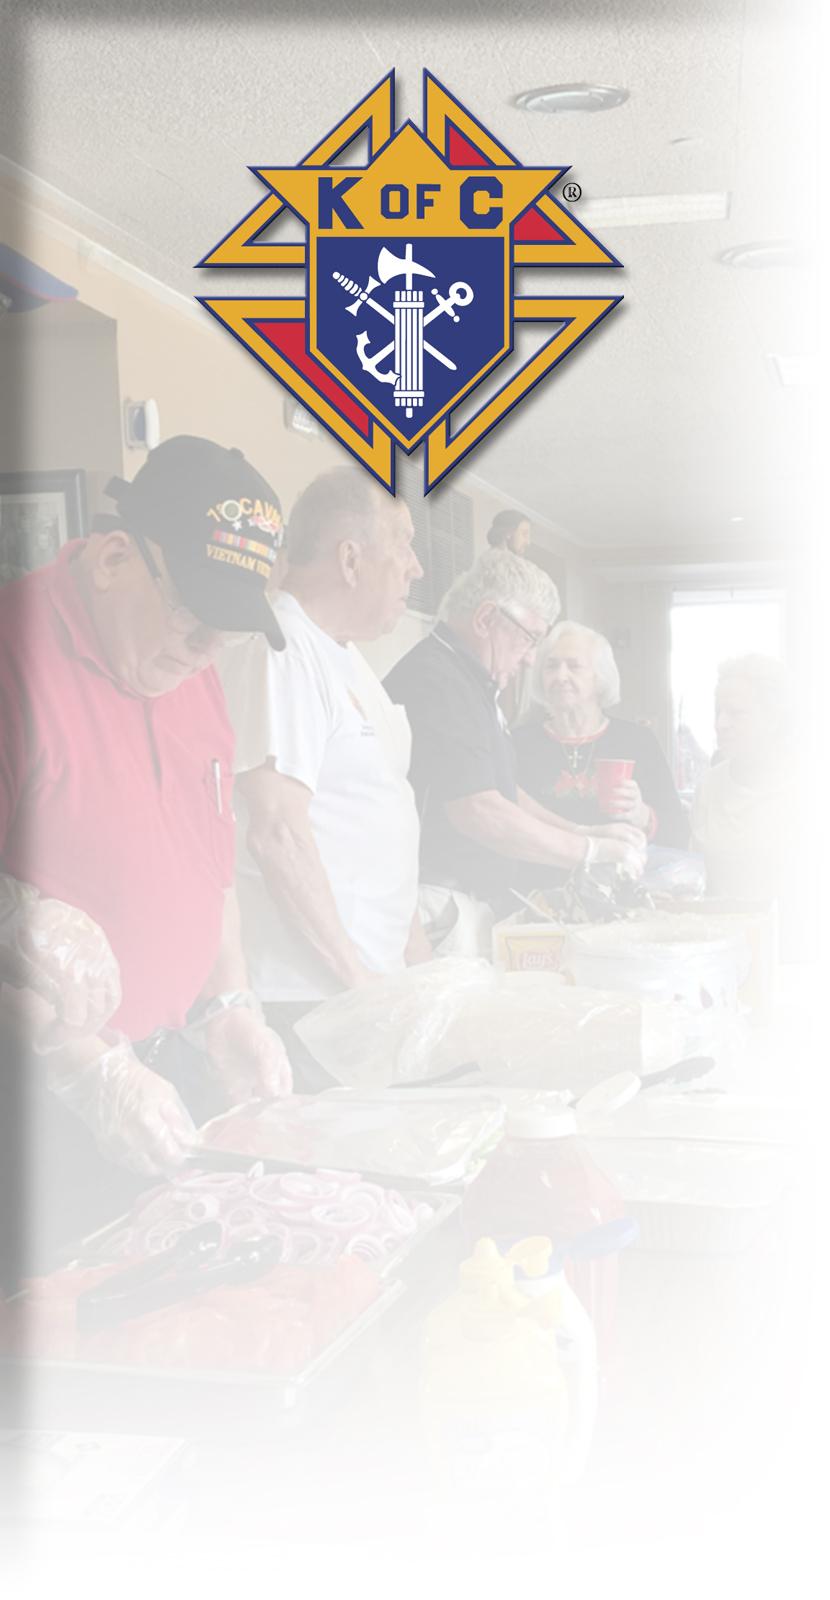 kofc-logo-knights-serving